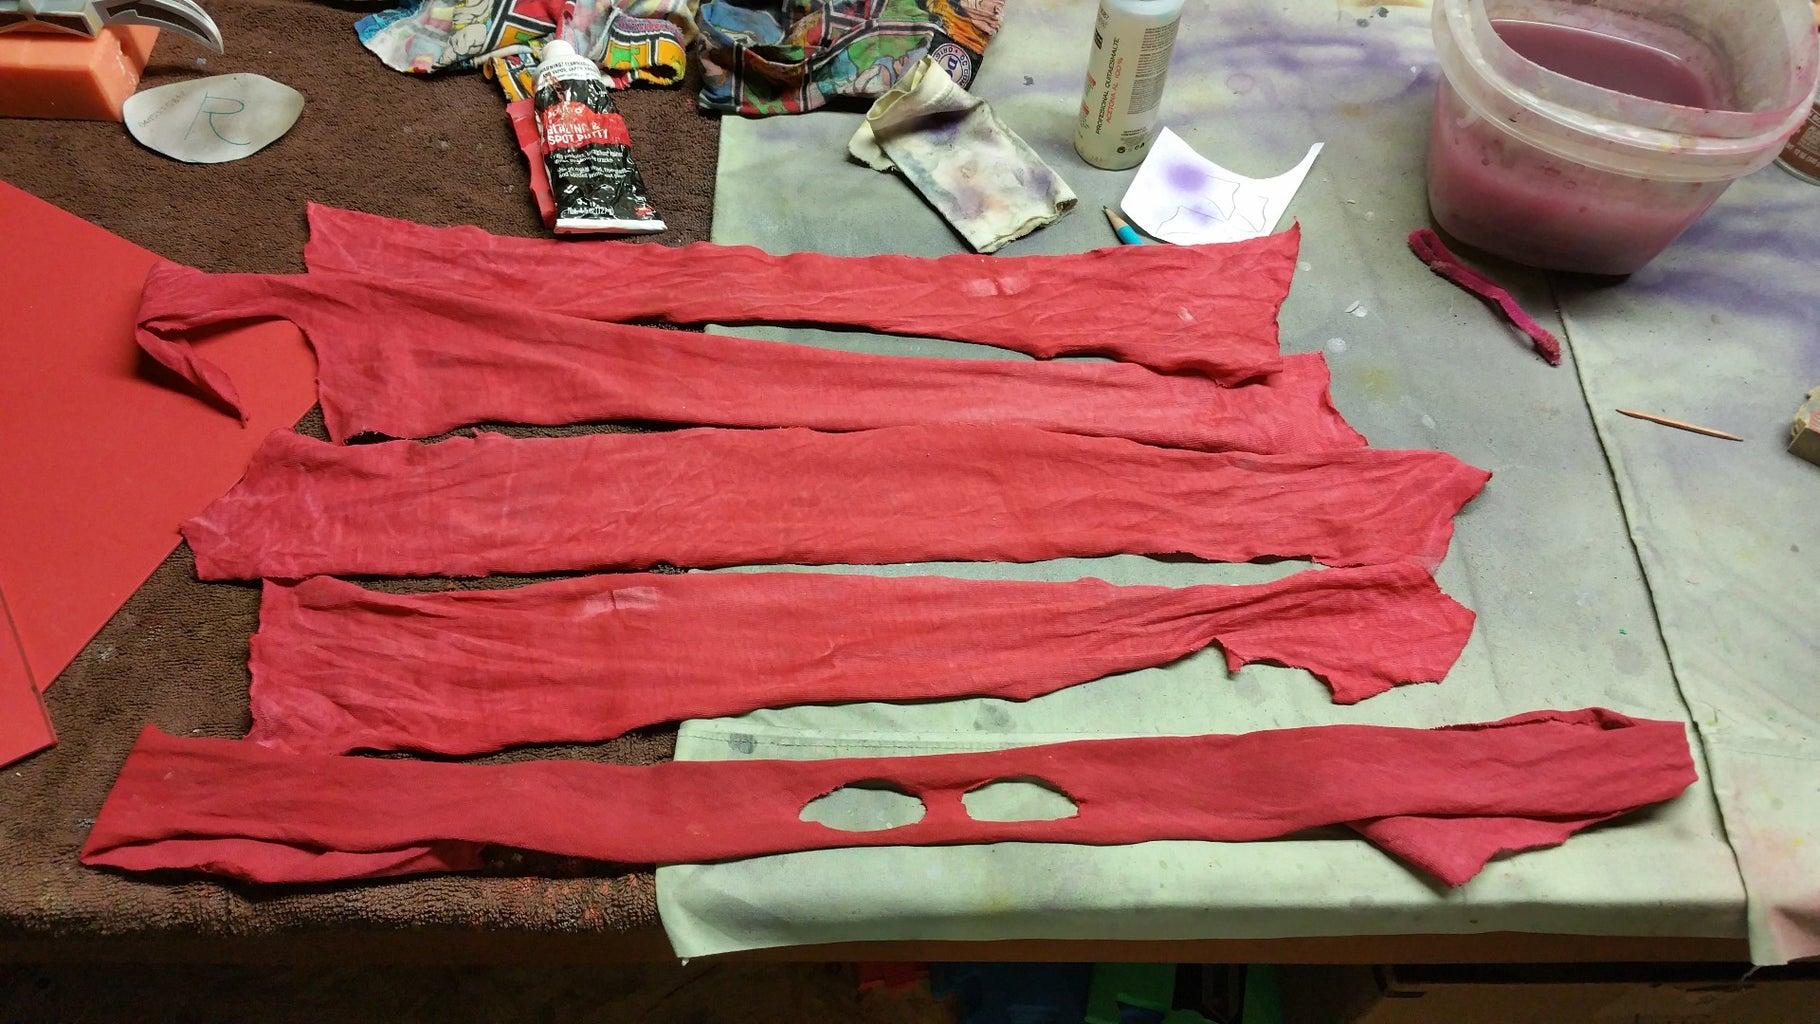 Mask, Arm, and Leg Wraps